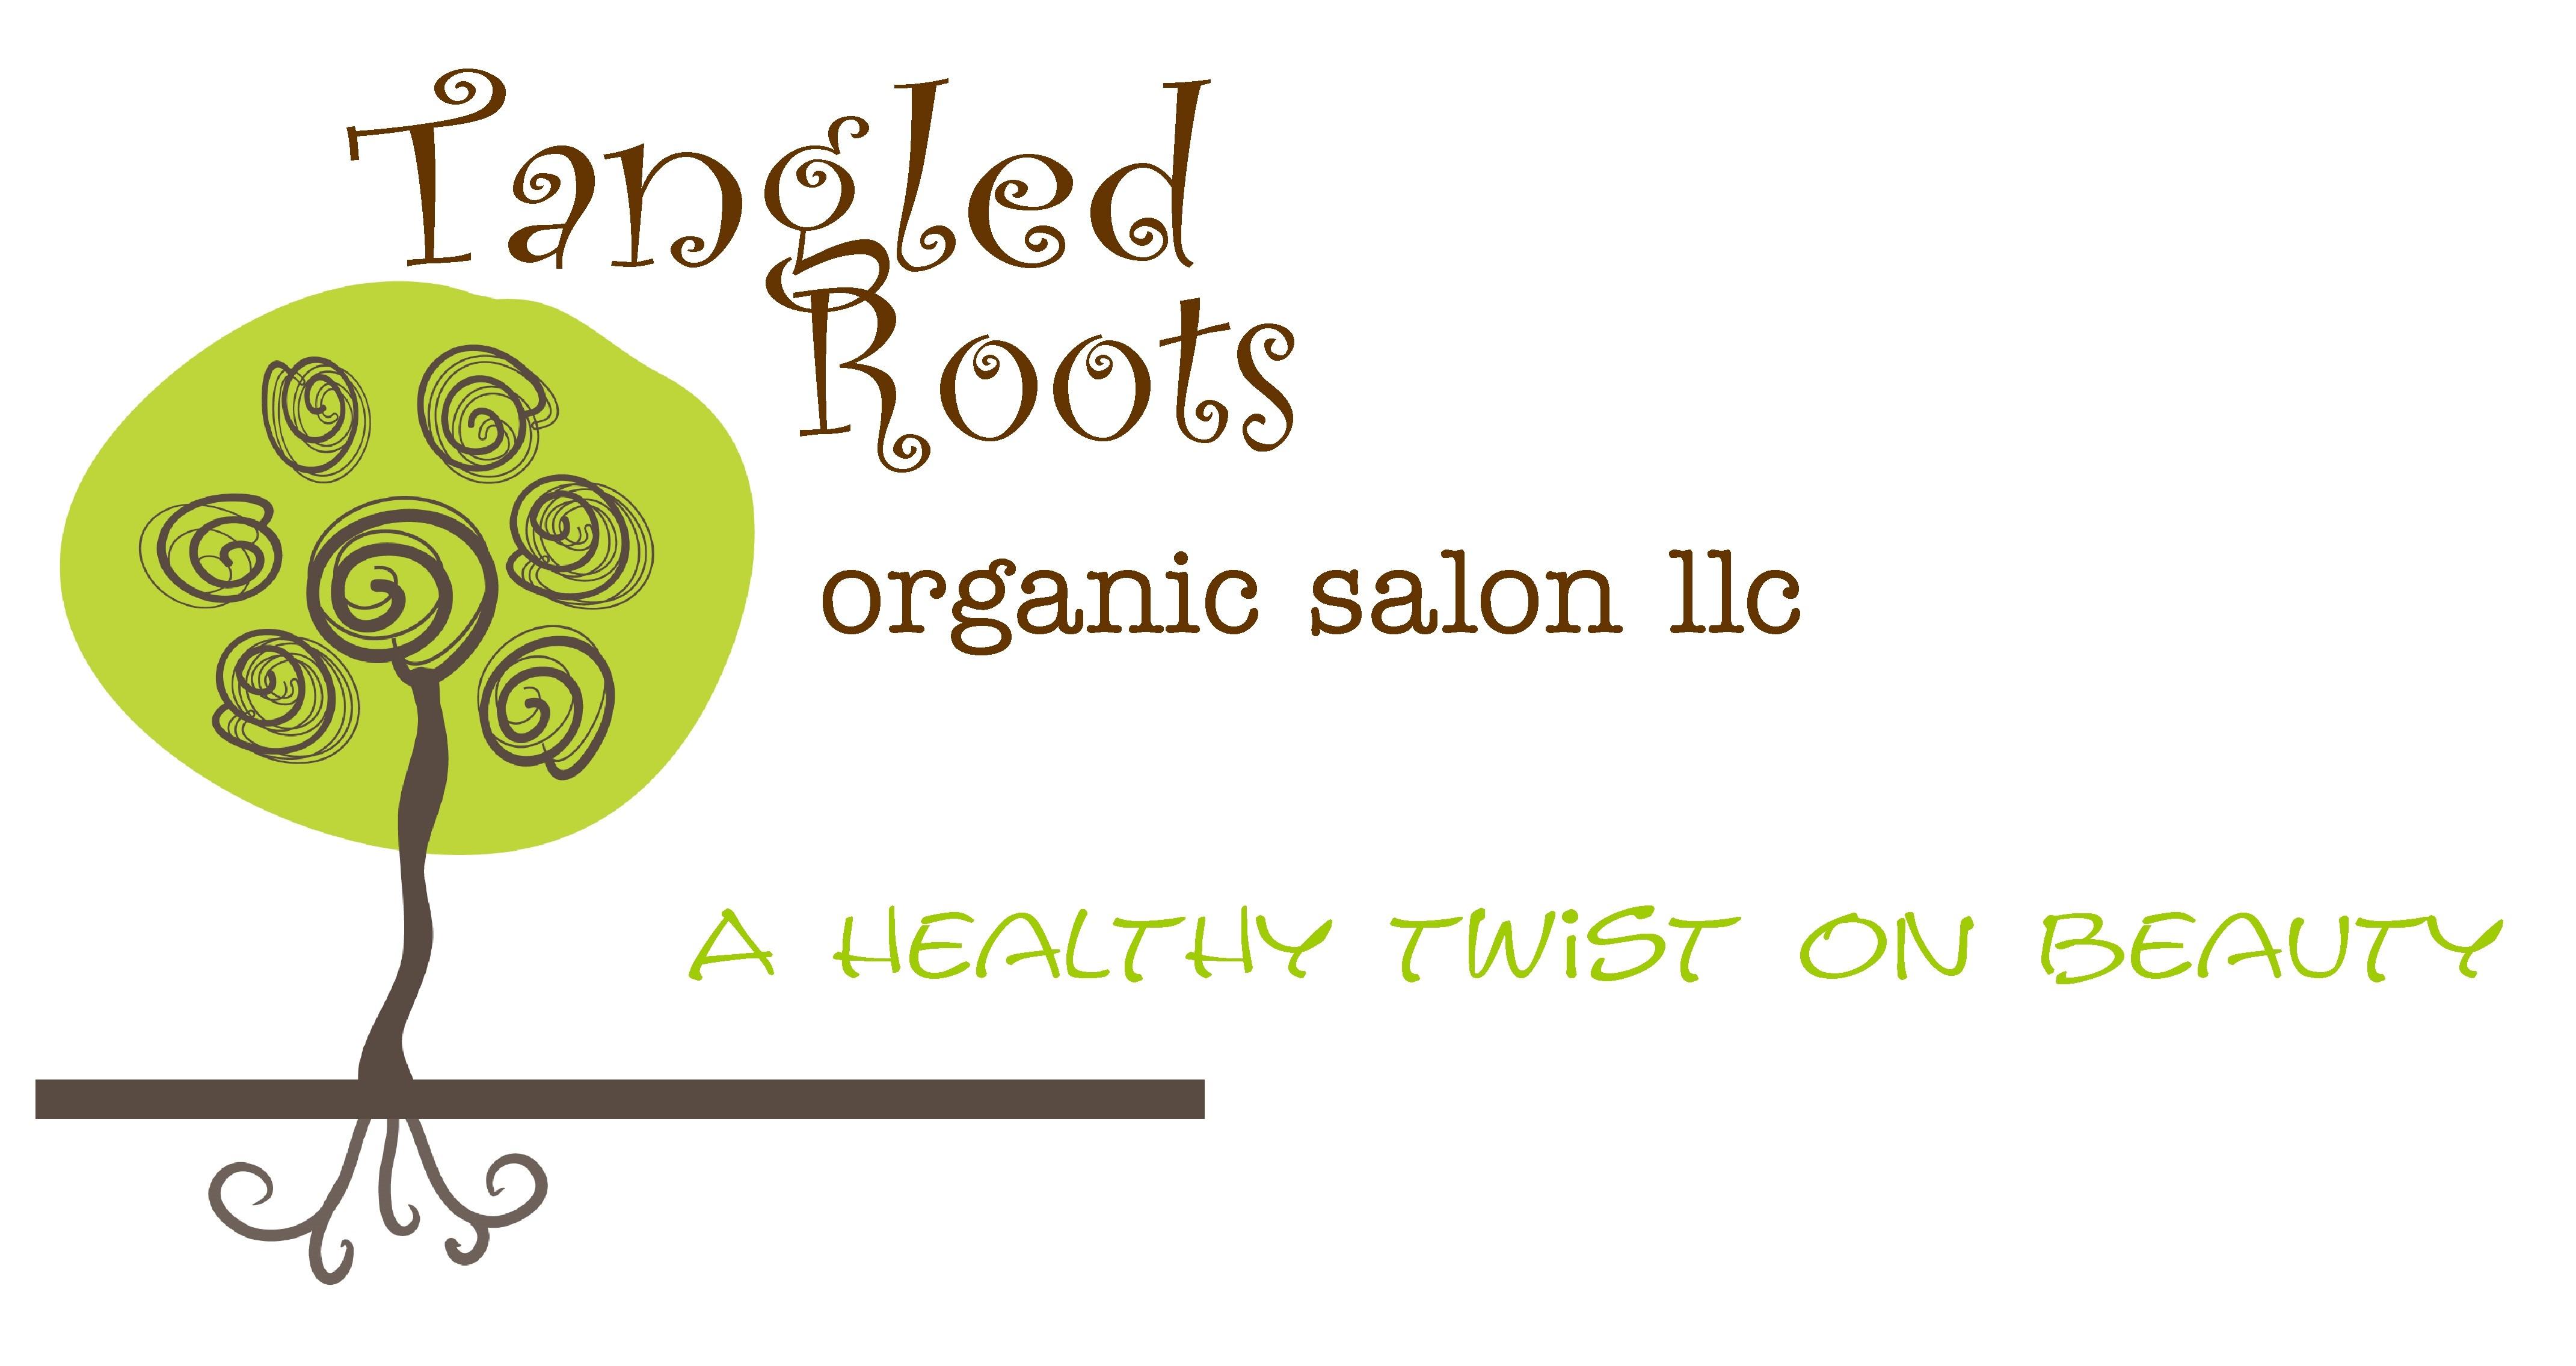 tangled-2-roots-logo-2-.jpg